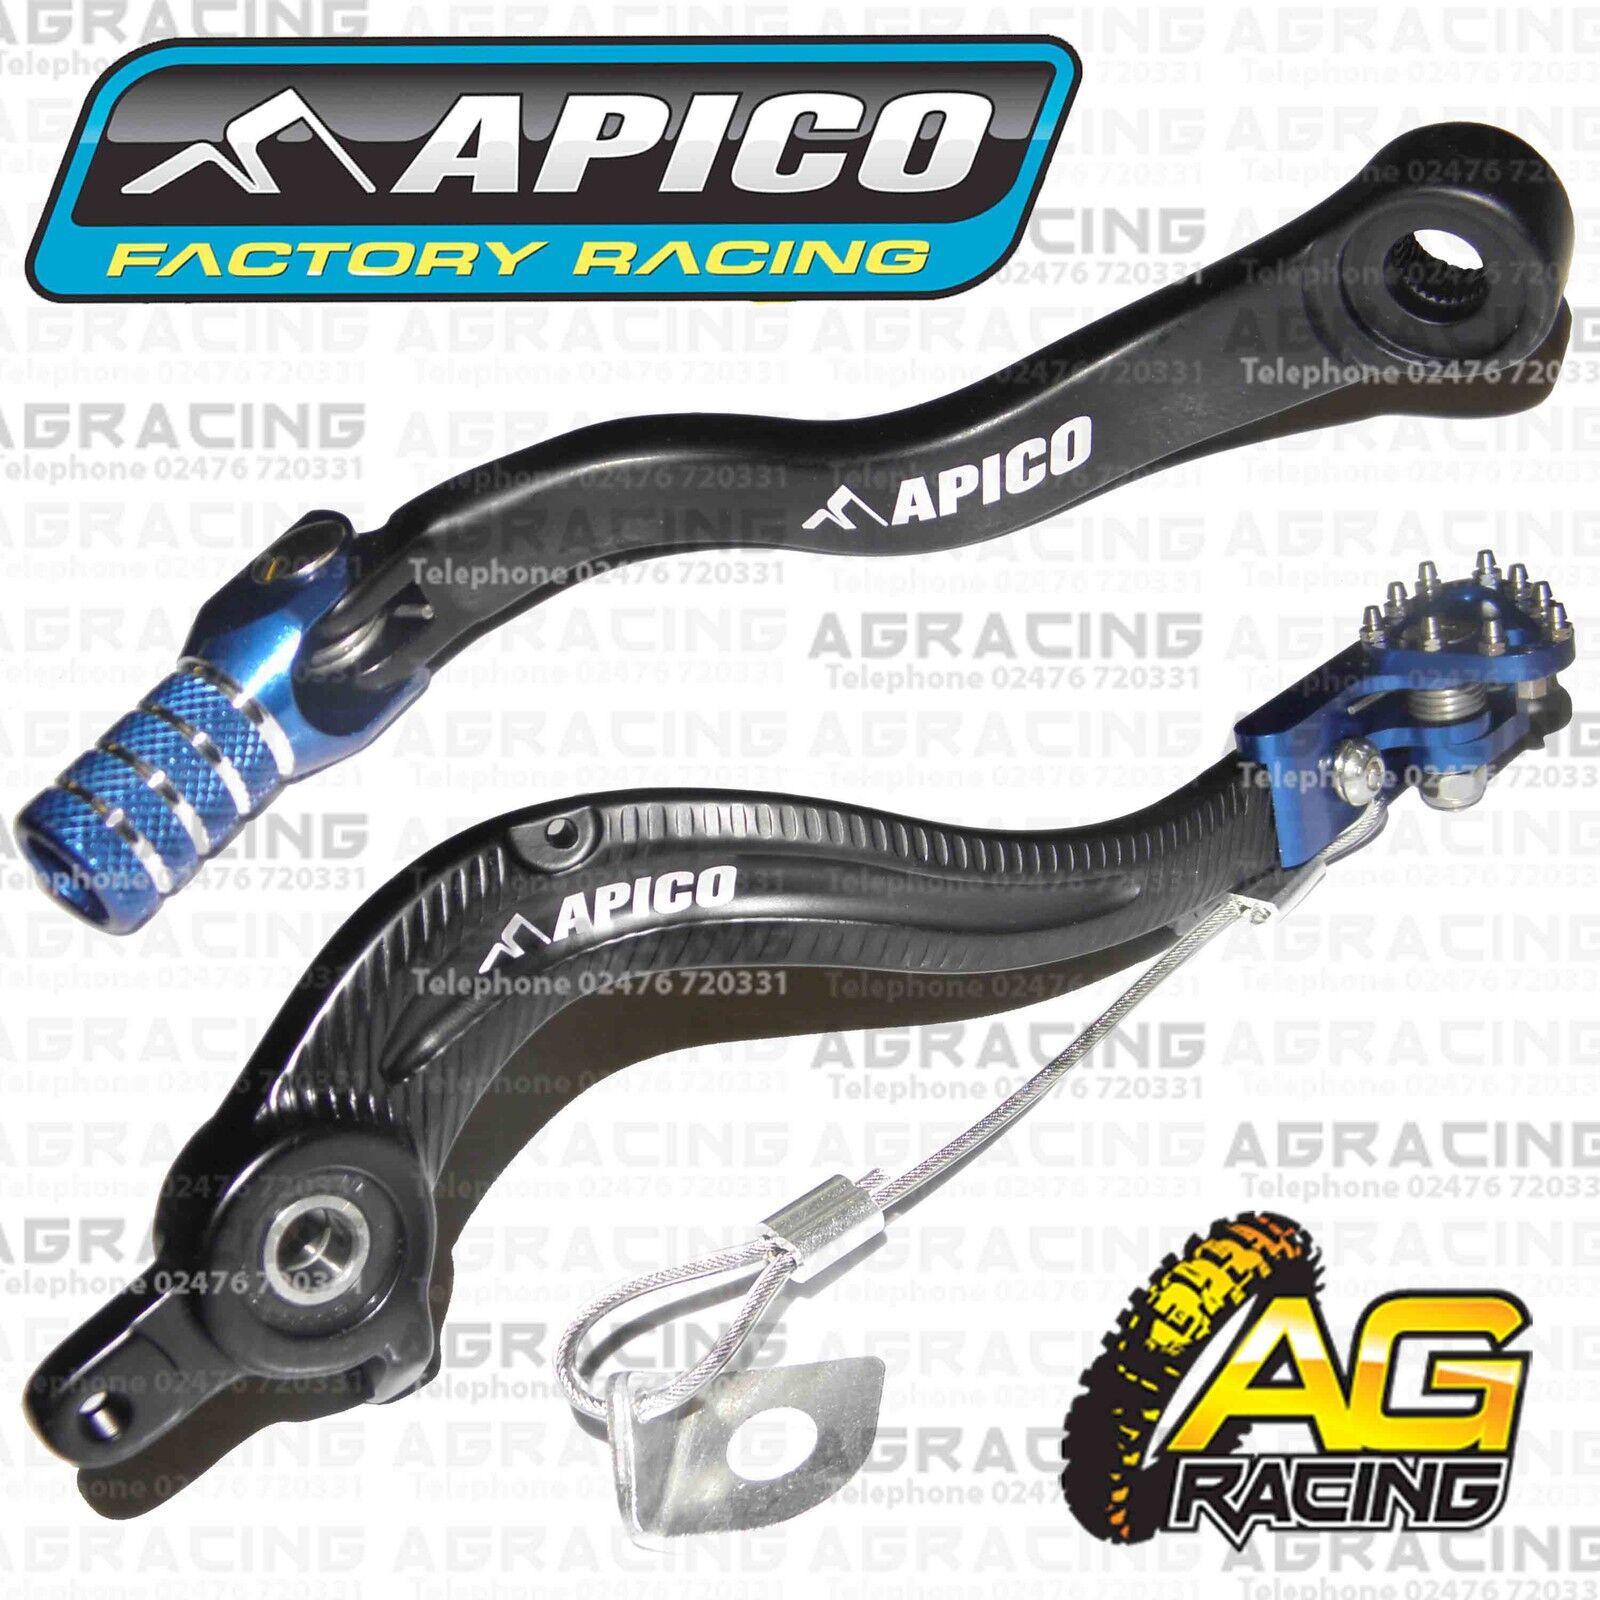 Apico Black Orange Gear Pedal Lever Shifter For KTM SX 450 2005 Motocross Enduro